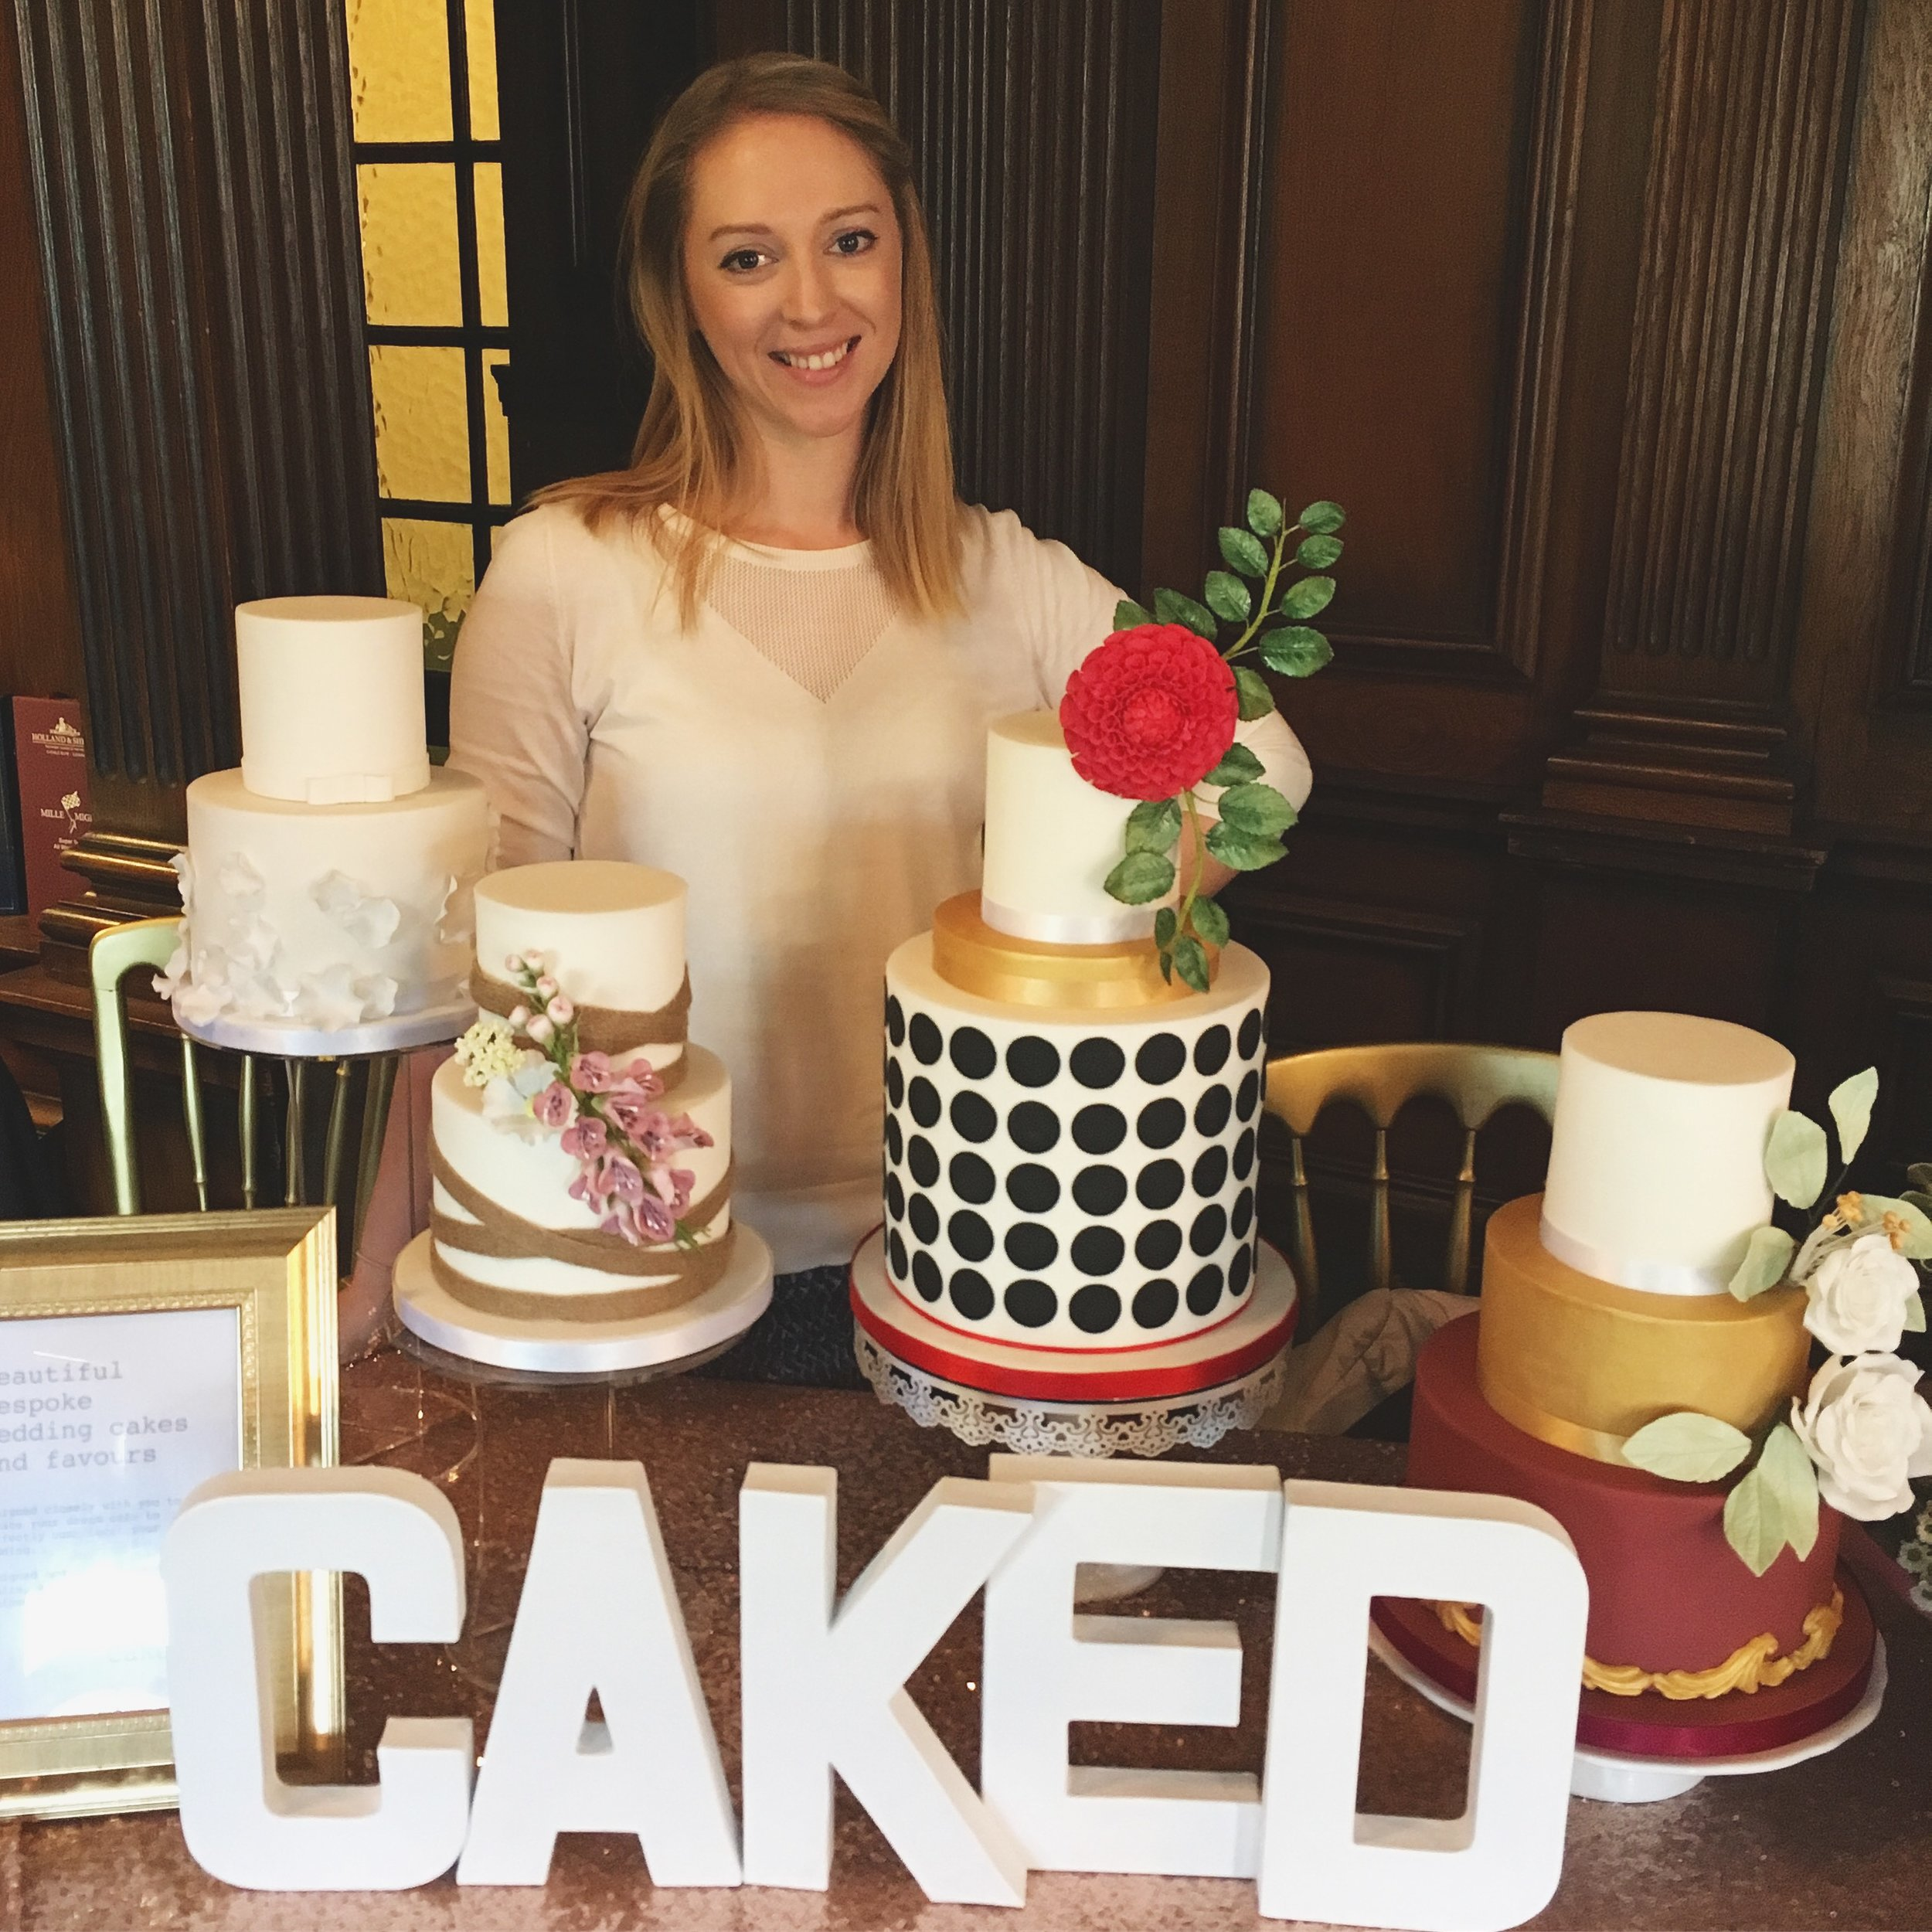 Caked wedding fair - Claire Thomas